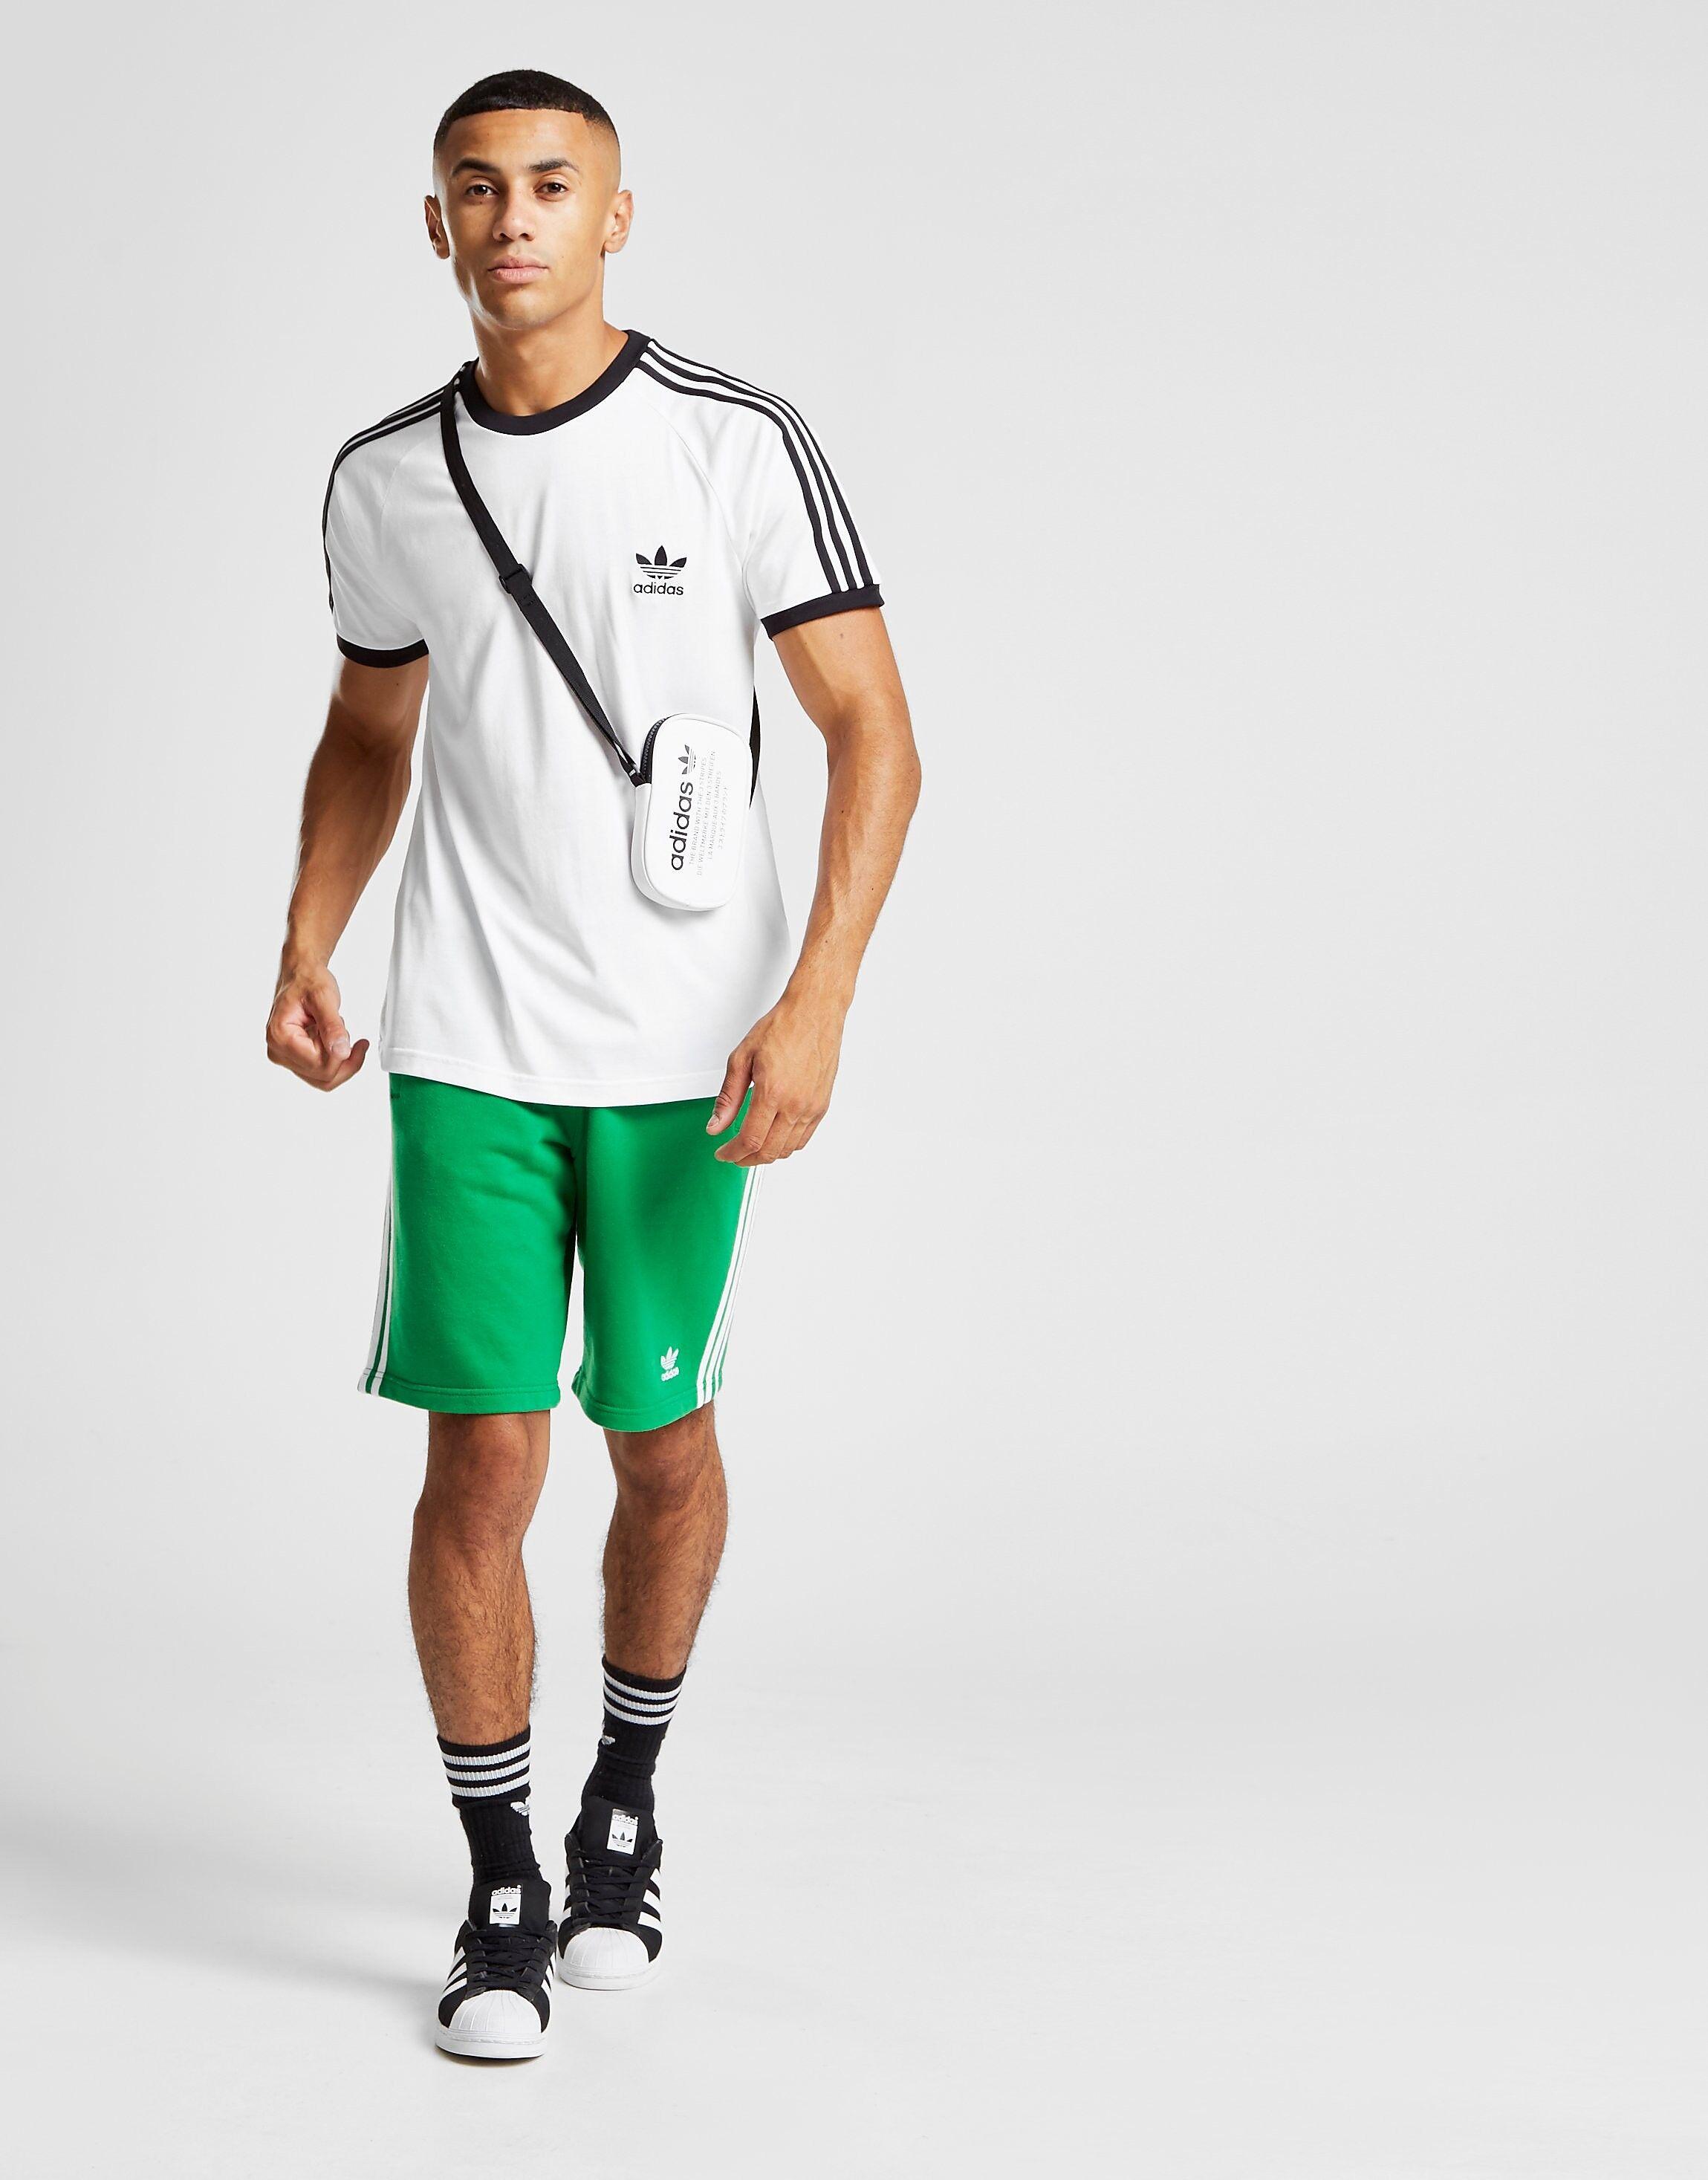 Image of Adidas Originals 3-Stripes California T-Paita Miehet - Mens, Valkoinen